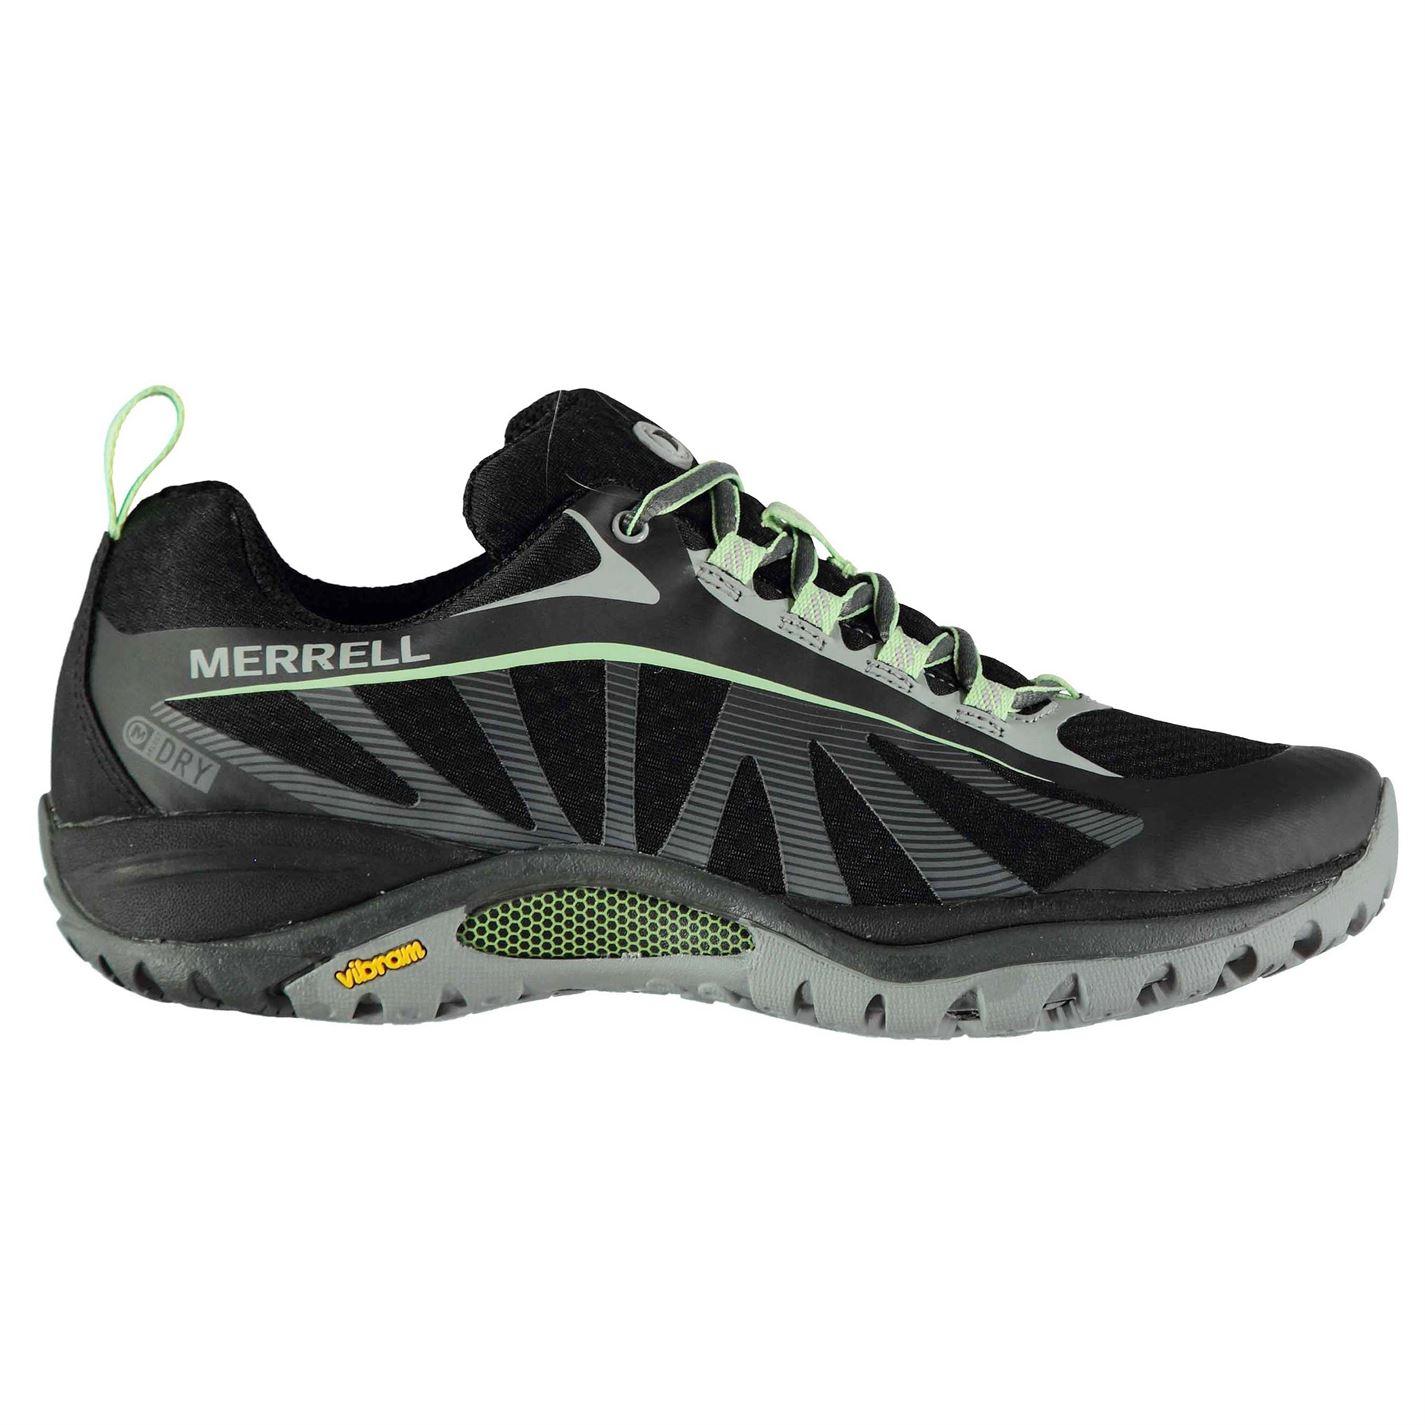 bda1049768bb Merrell Siren Edge Waterproof Ladies Walking Shoes